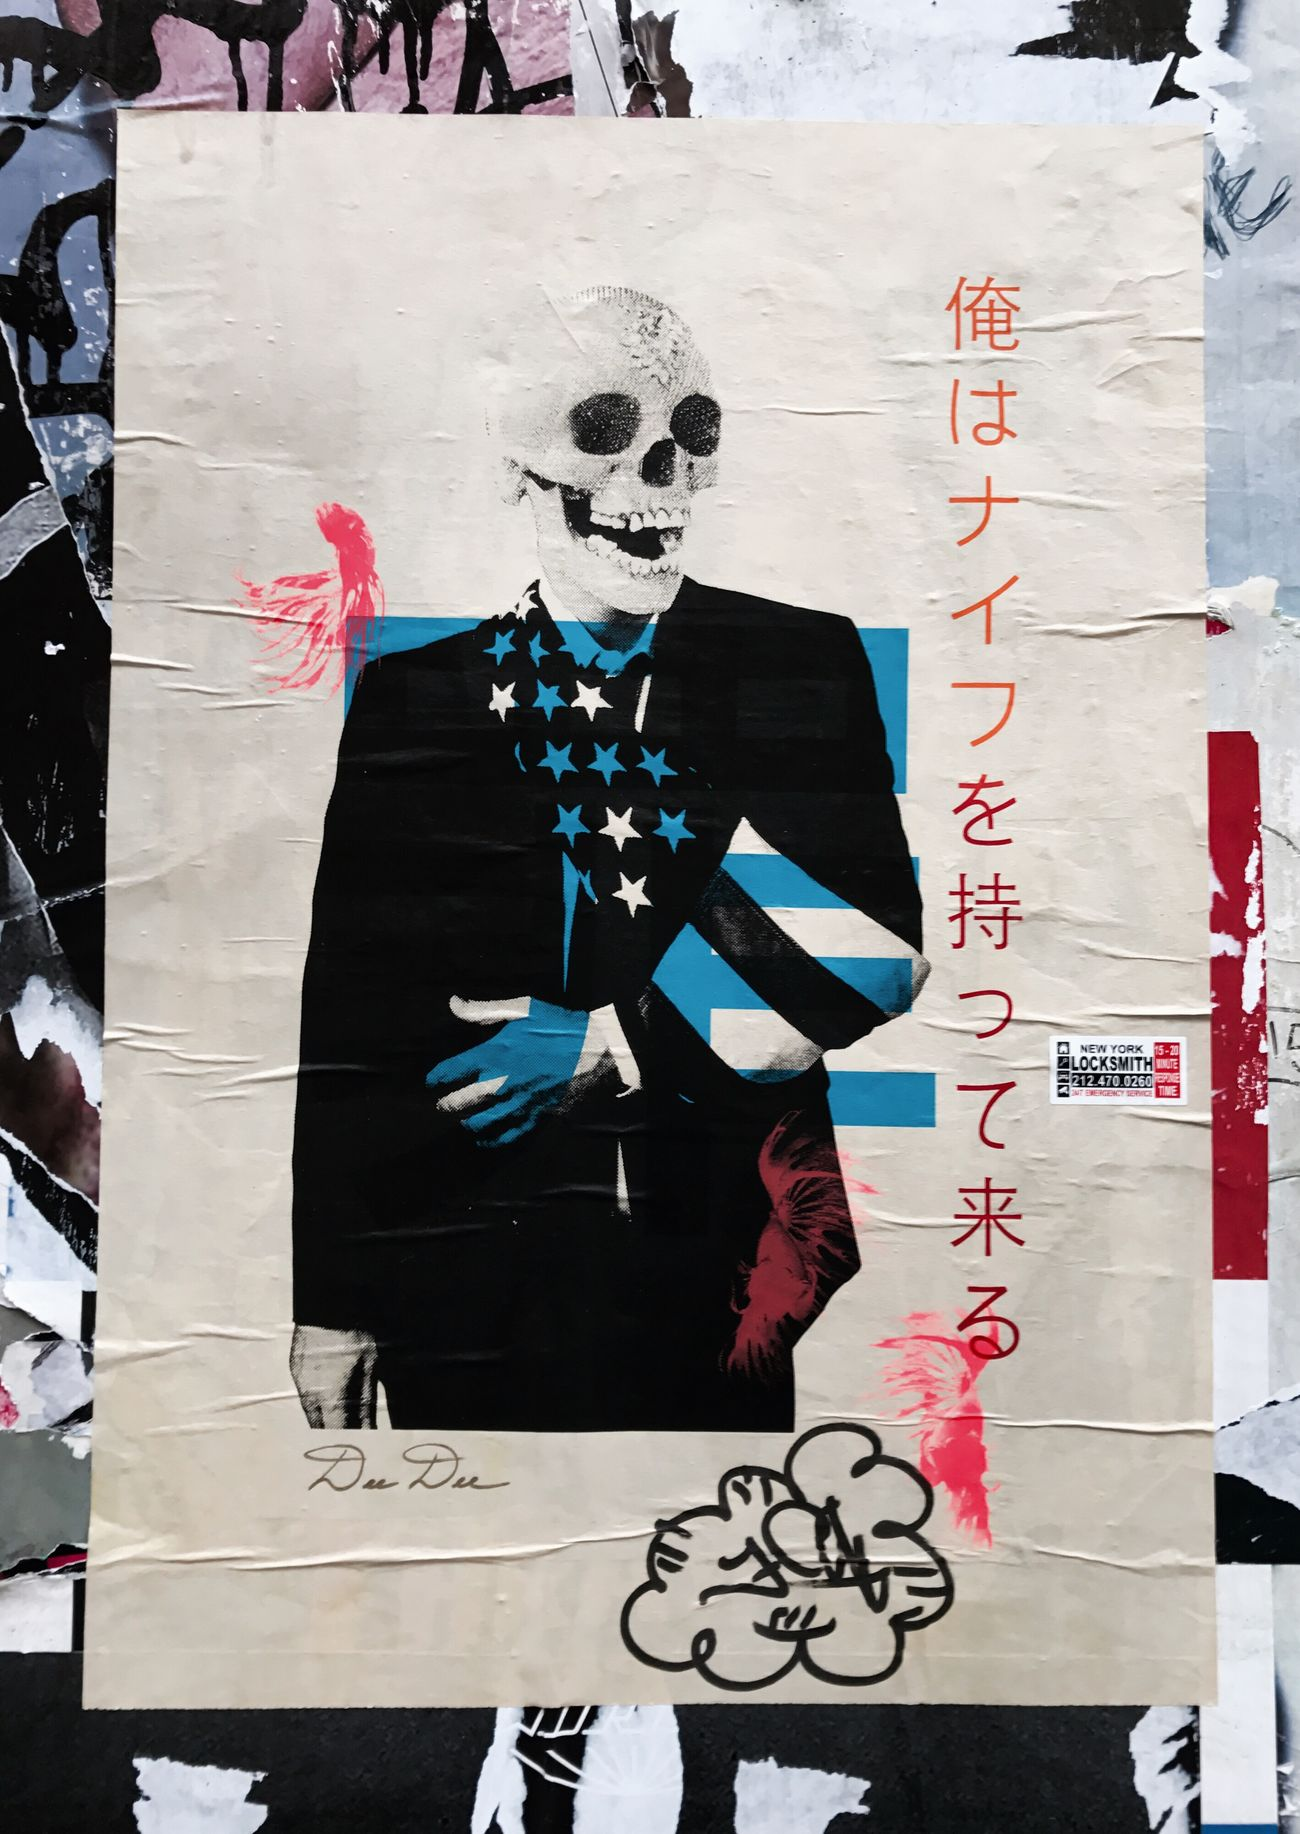 #deedee #street #art #soho #manhattan #nyc #winter2017 #timyoungstudionyc #timyoungiphoneography